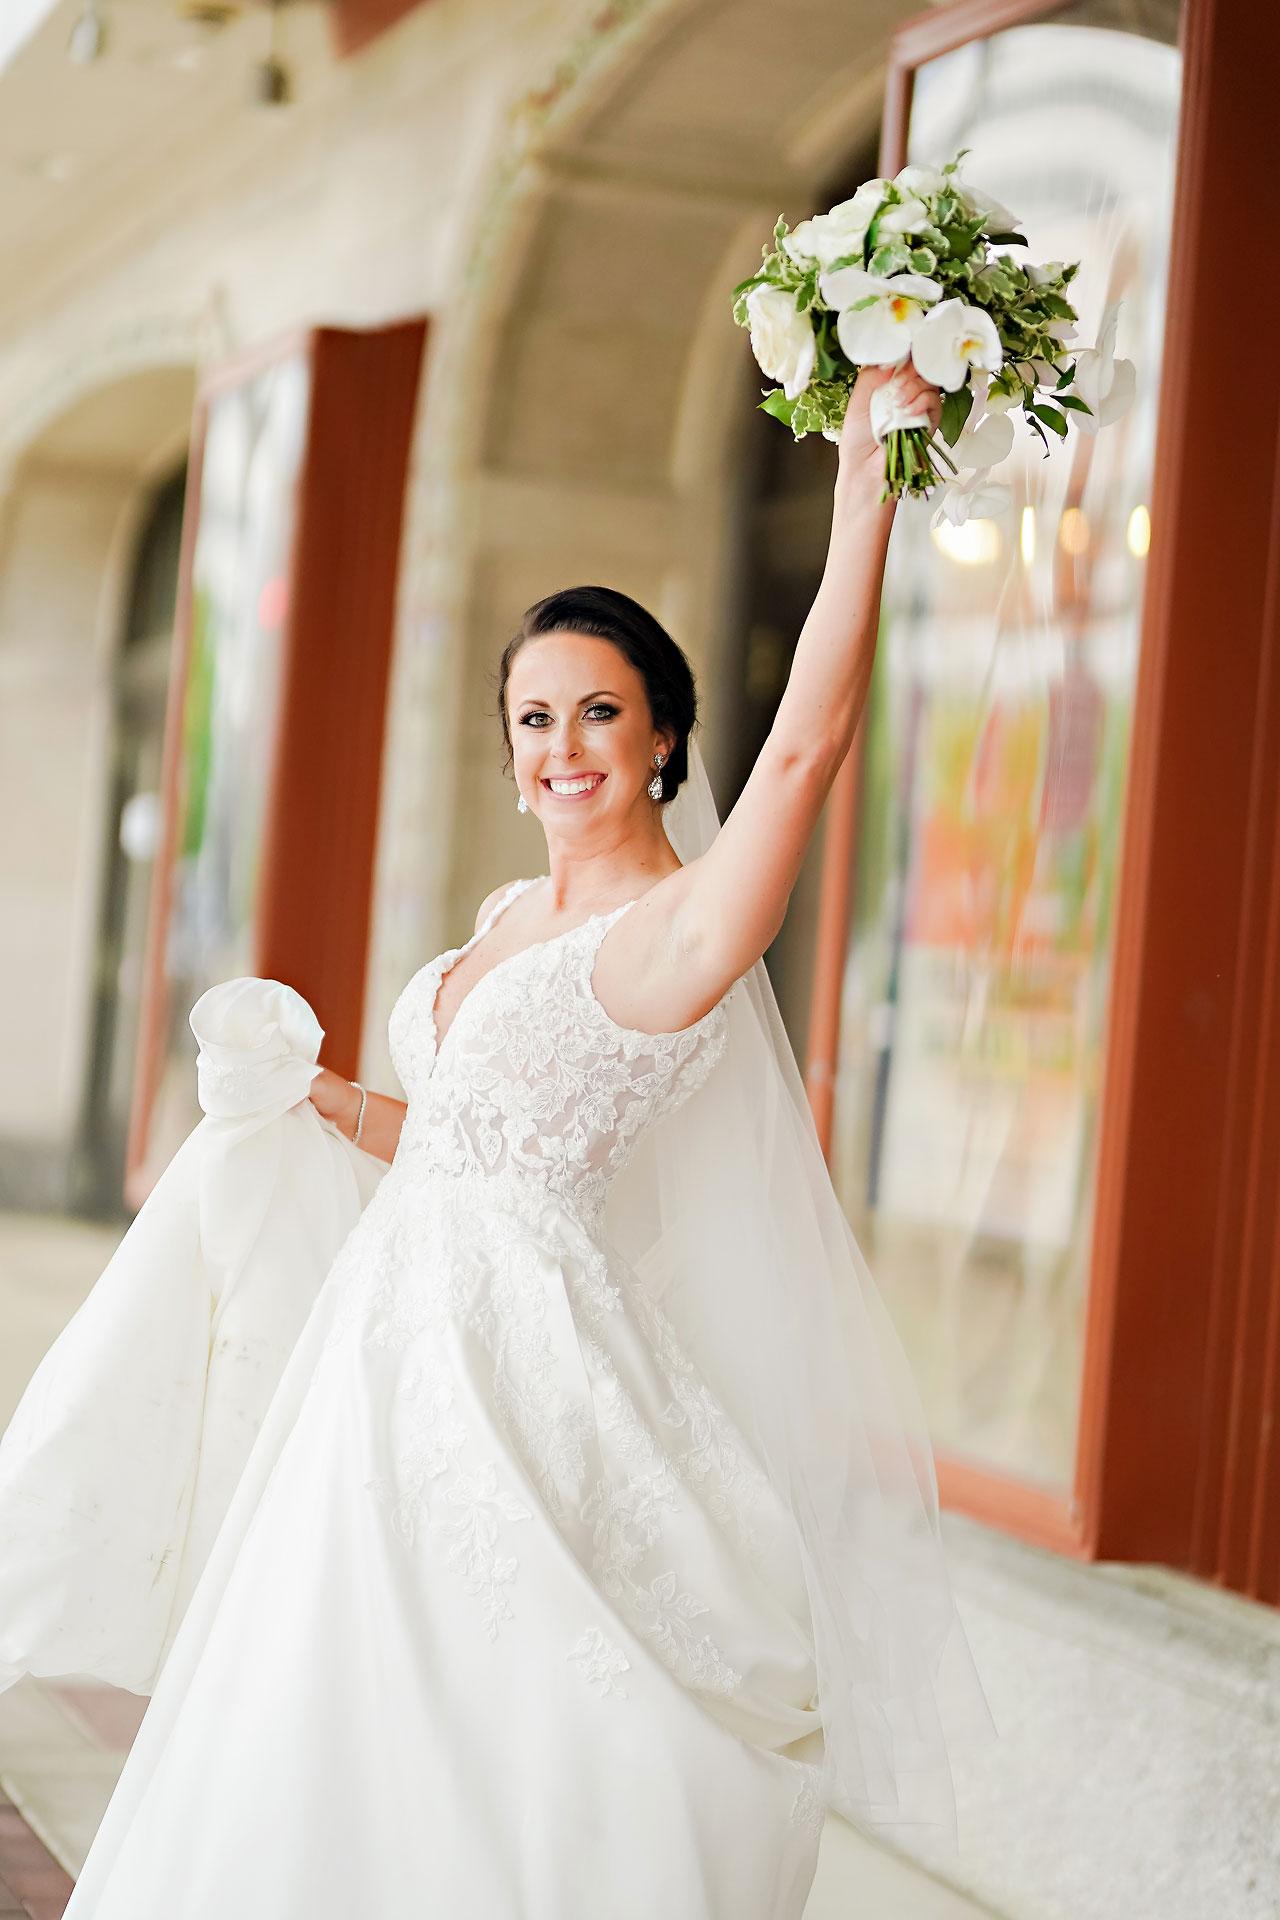 Michelle Casey Palais Royale South Bend Wedding 120